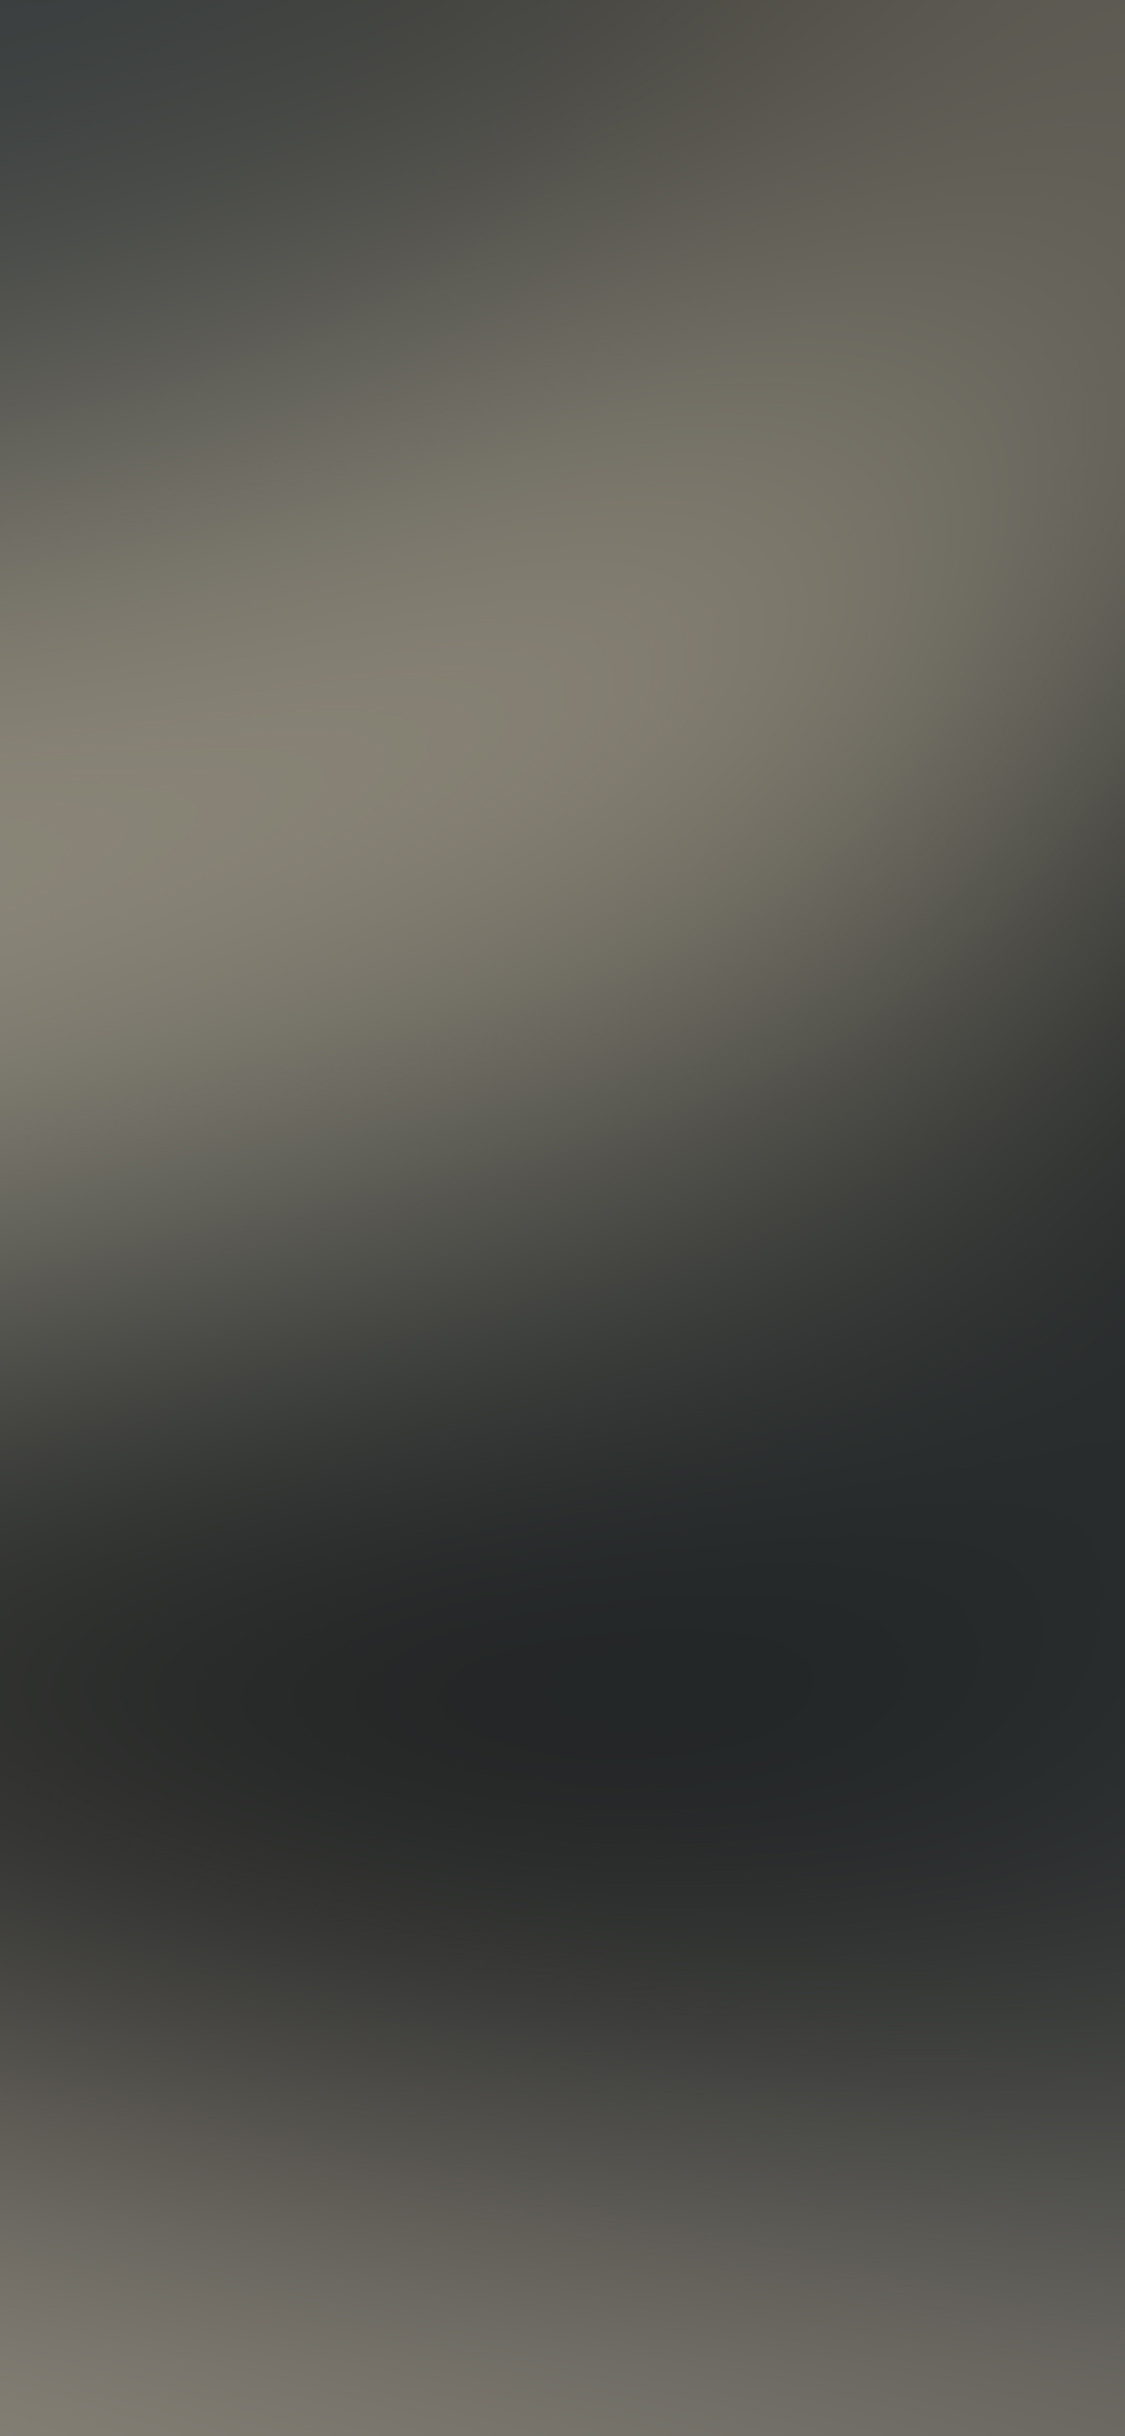 Com Apple Iphone Wallpaper Sj61 Gray Dark Gradation - Dark Gray Iphone X , HD Wallpaper & Backgrounds